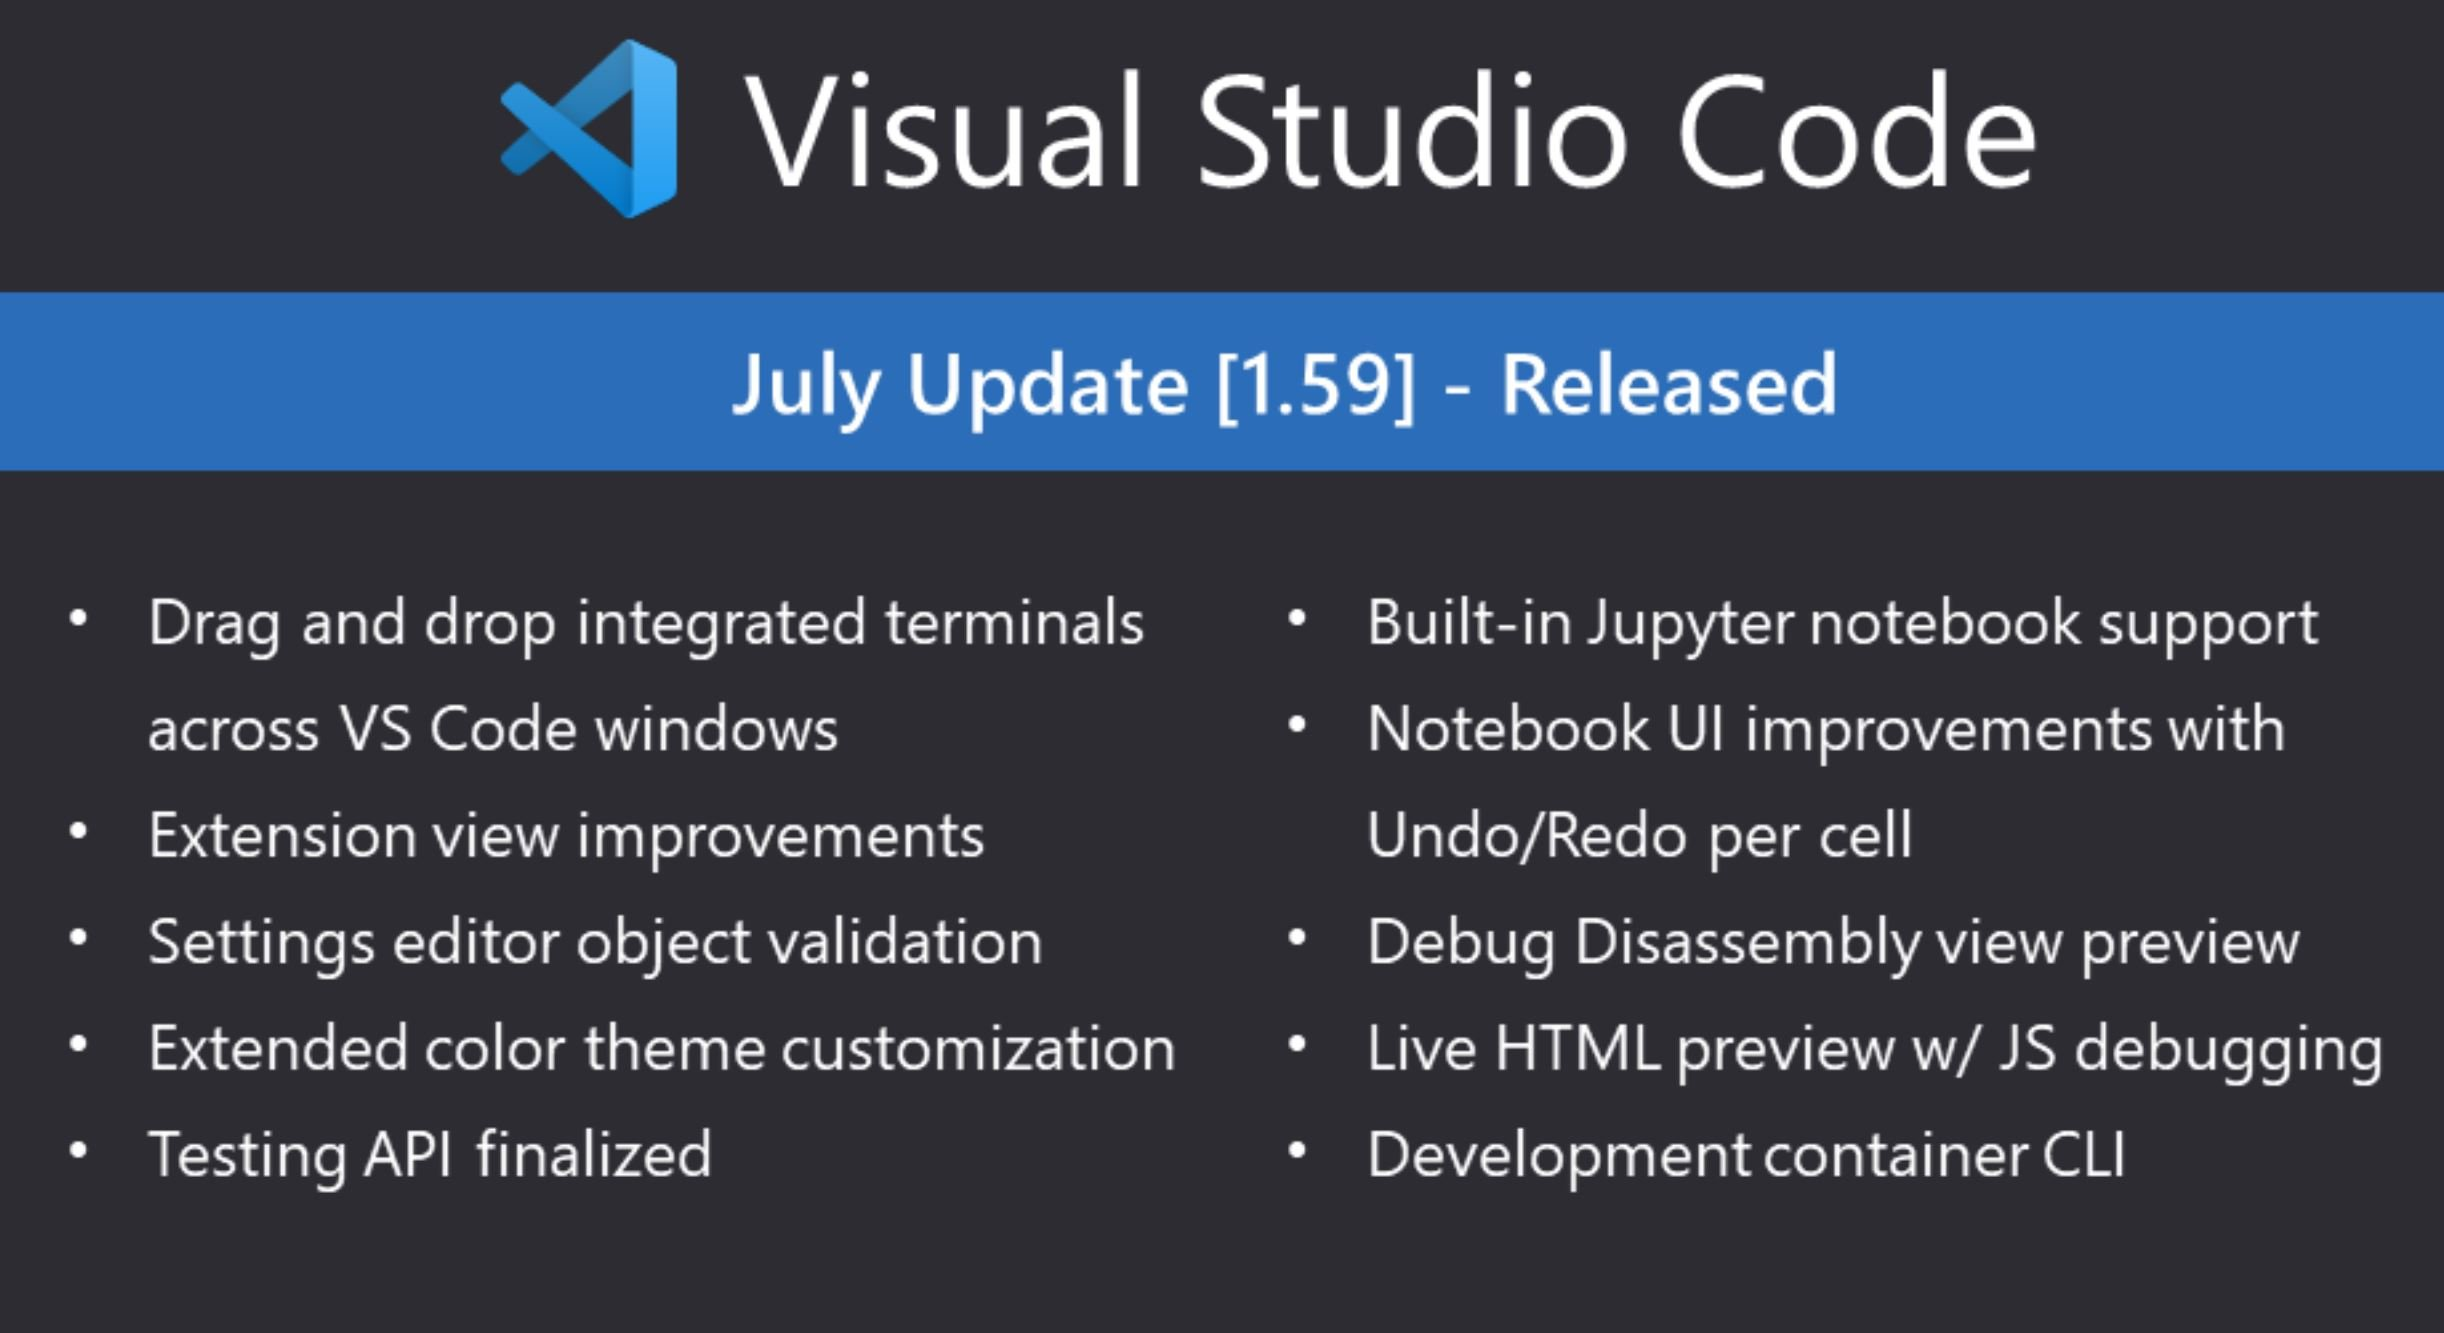 Microsoft Visual Studio Code v1.59